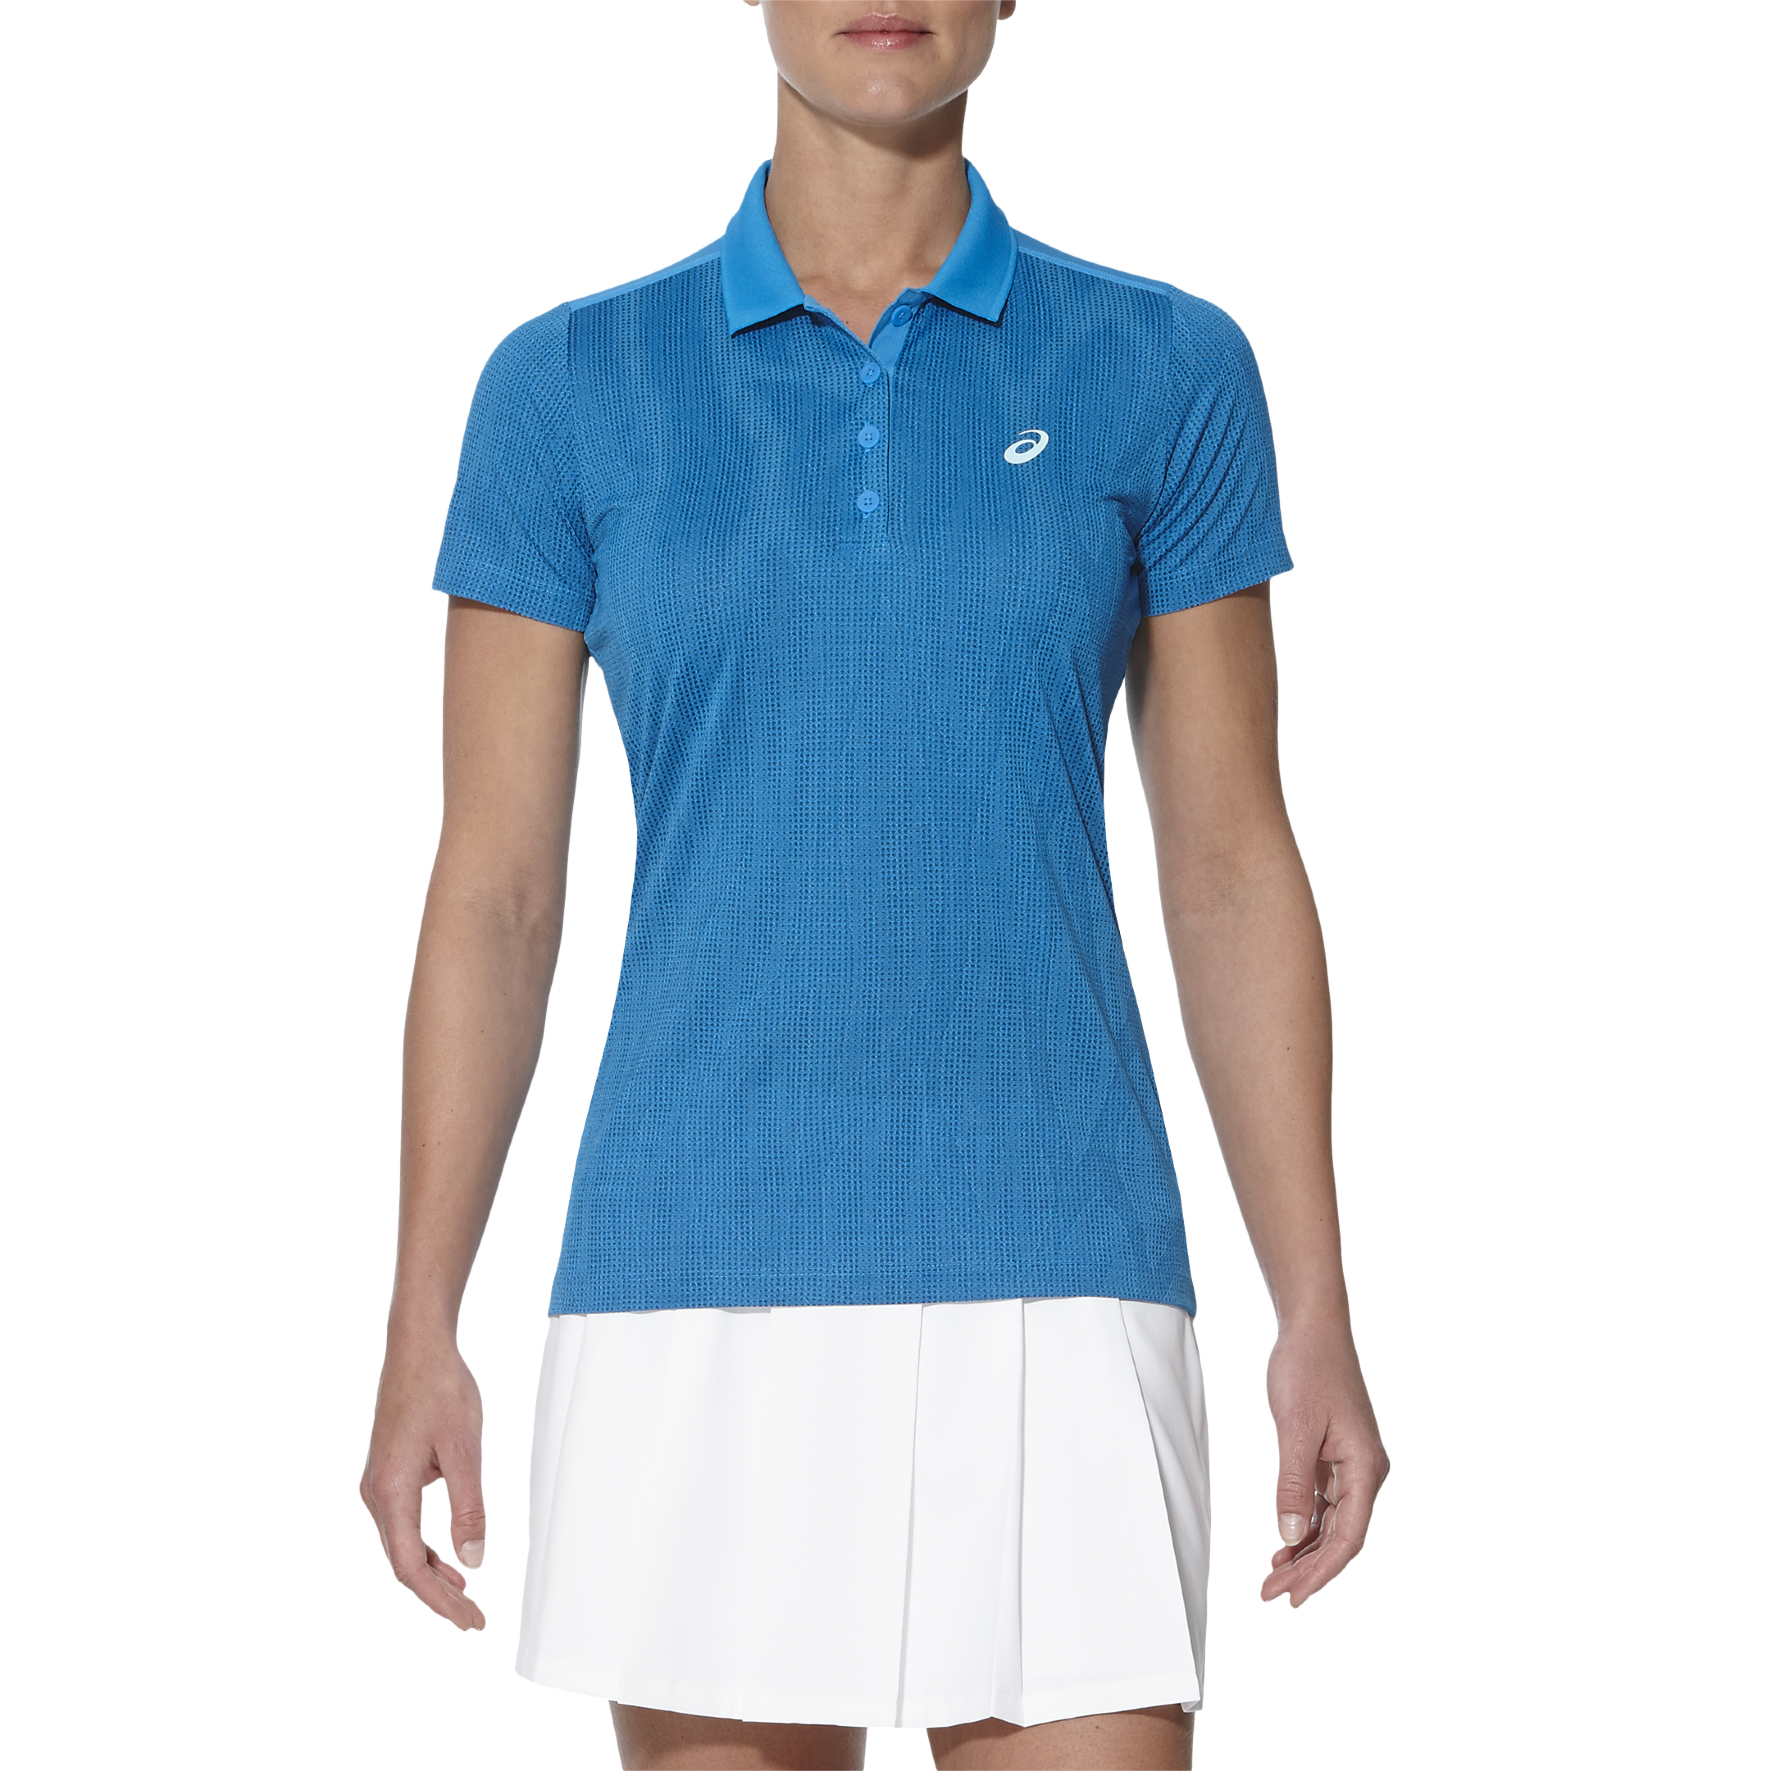 Asics GPX SS Ladies Tennis Polo - Blue, XL